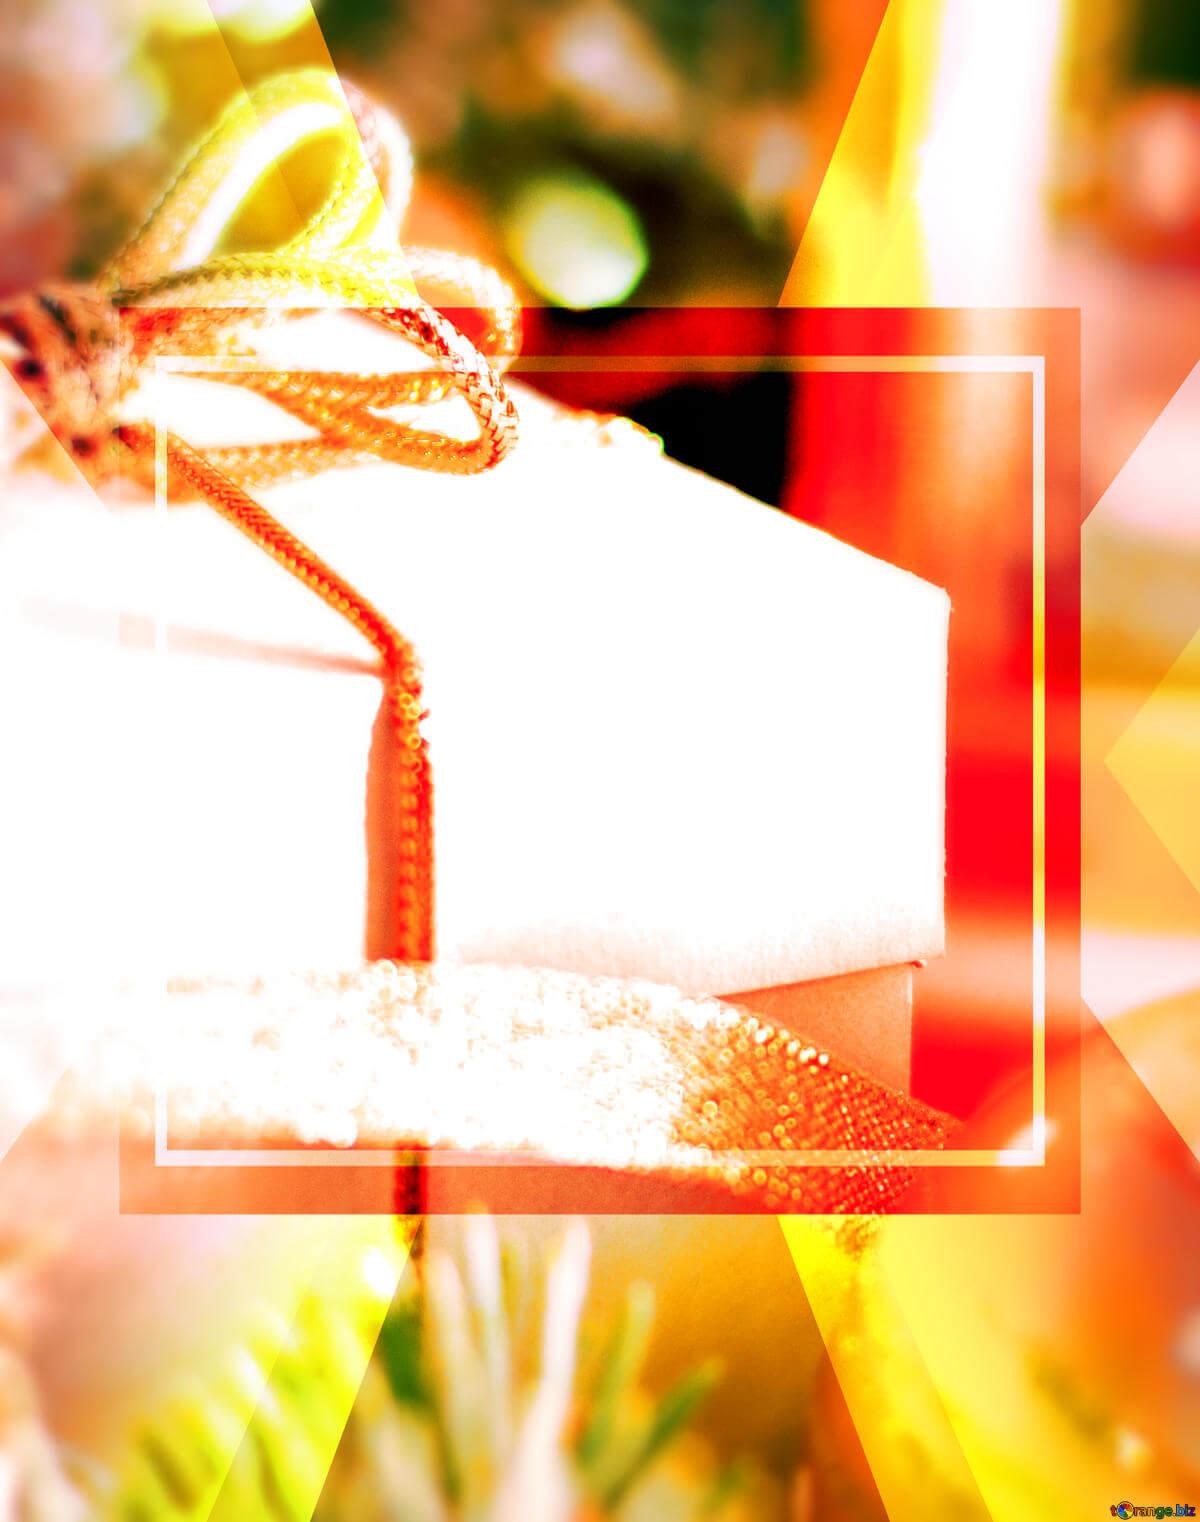 Скачать Бесплатно Картинку New Year Greeting Card Gift Throughout Greeting Card Template Powerpoint